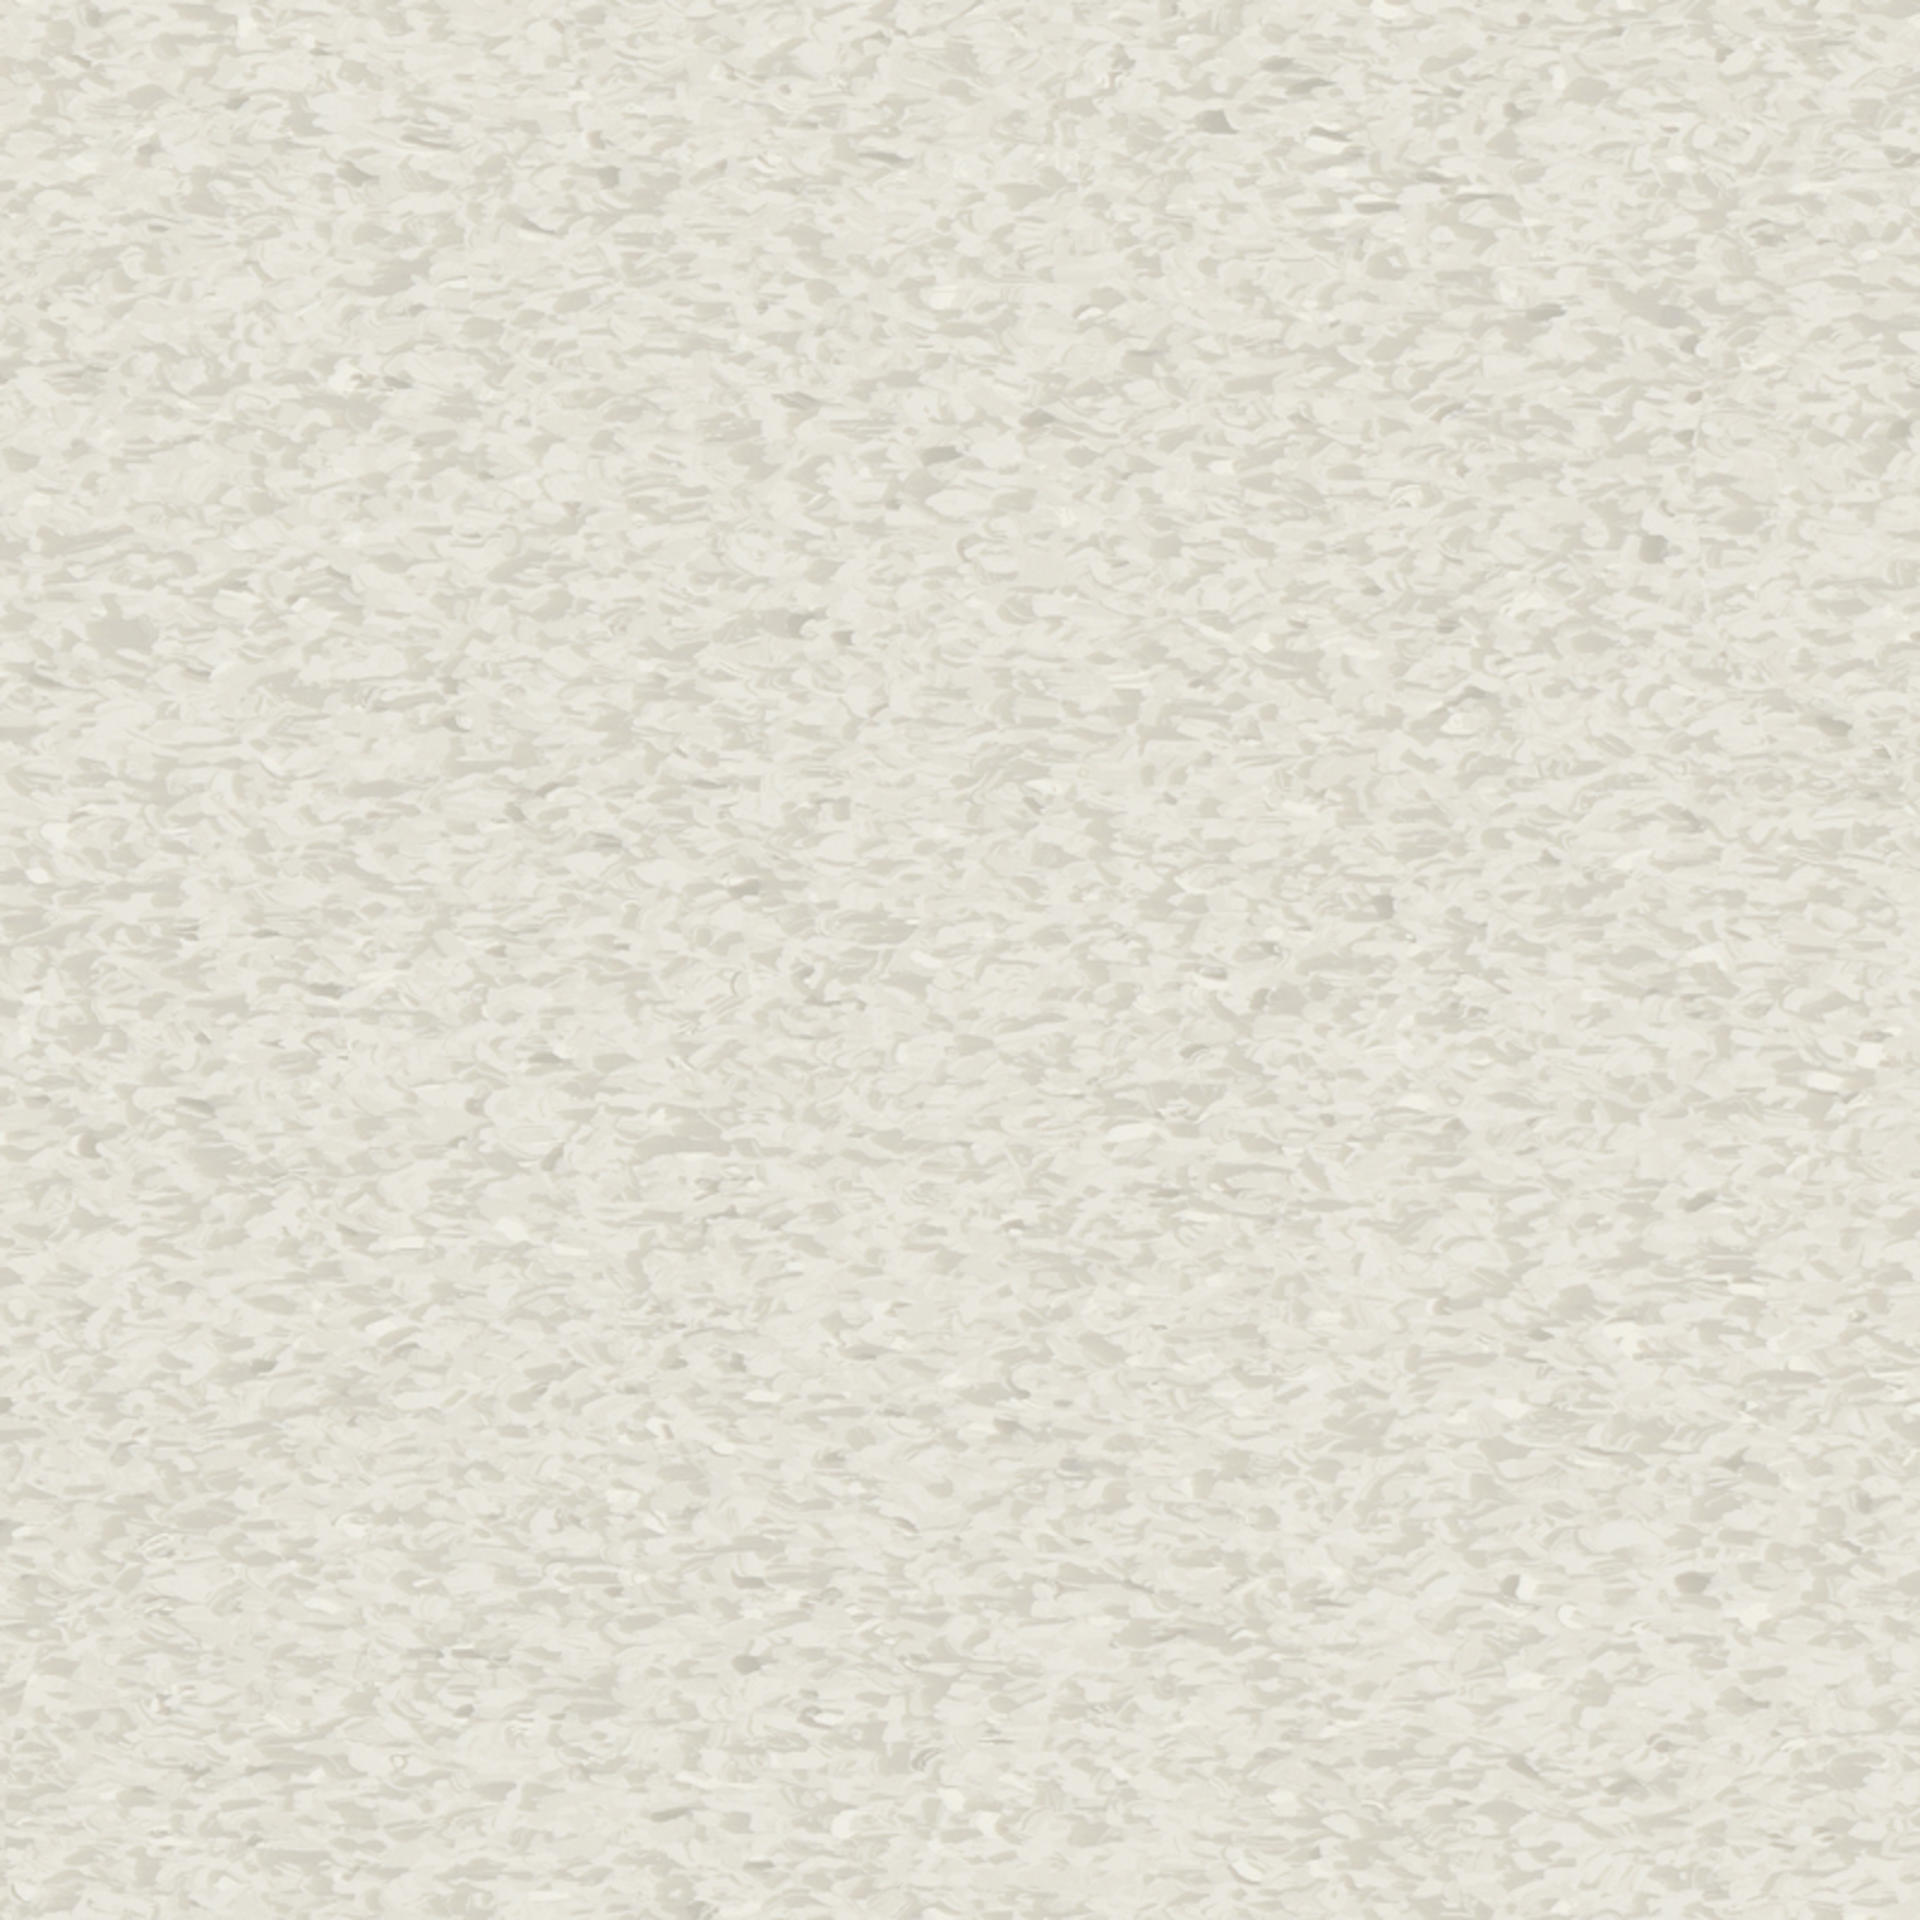 concrete-xtra-light-3040445